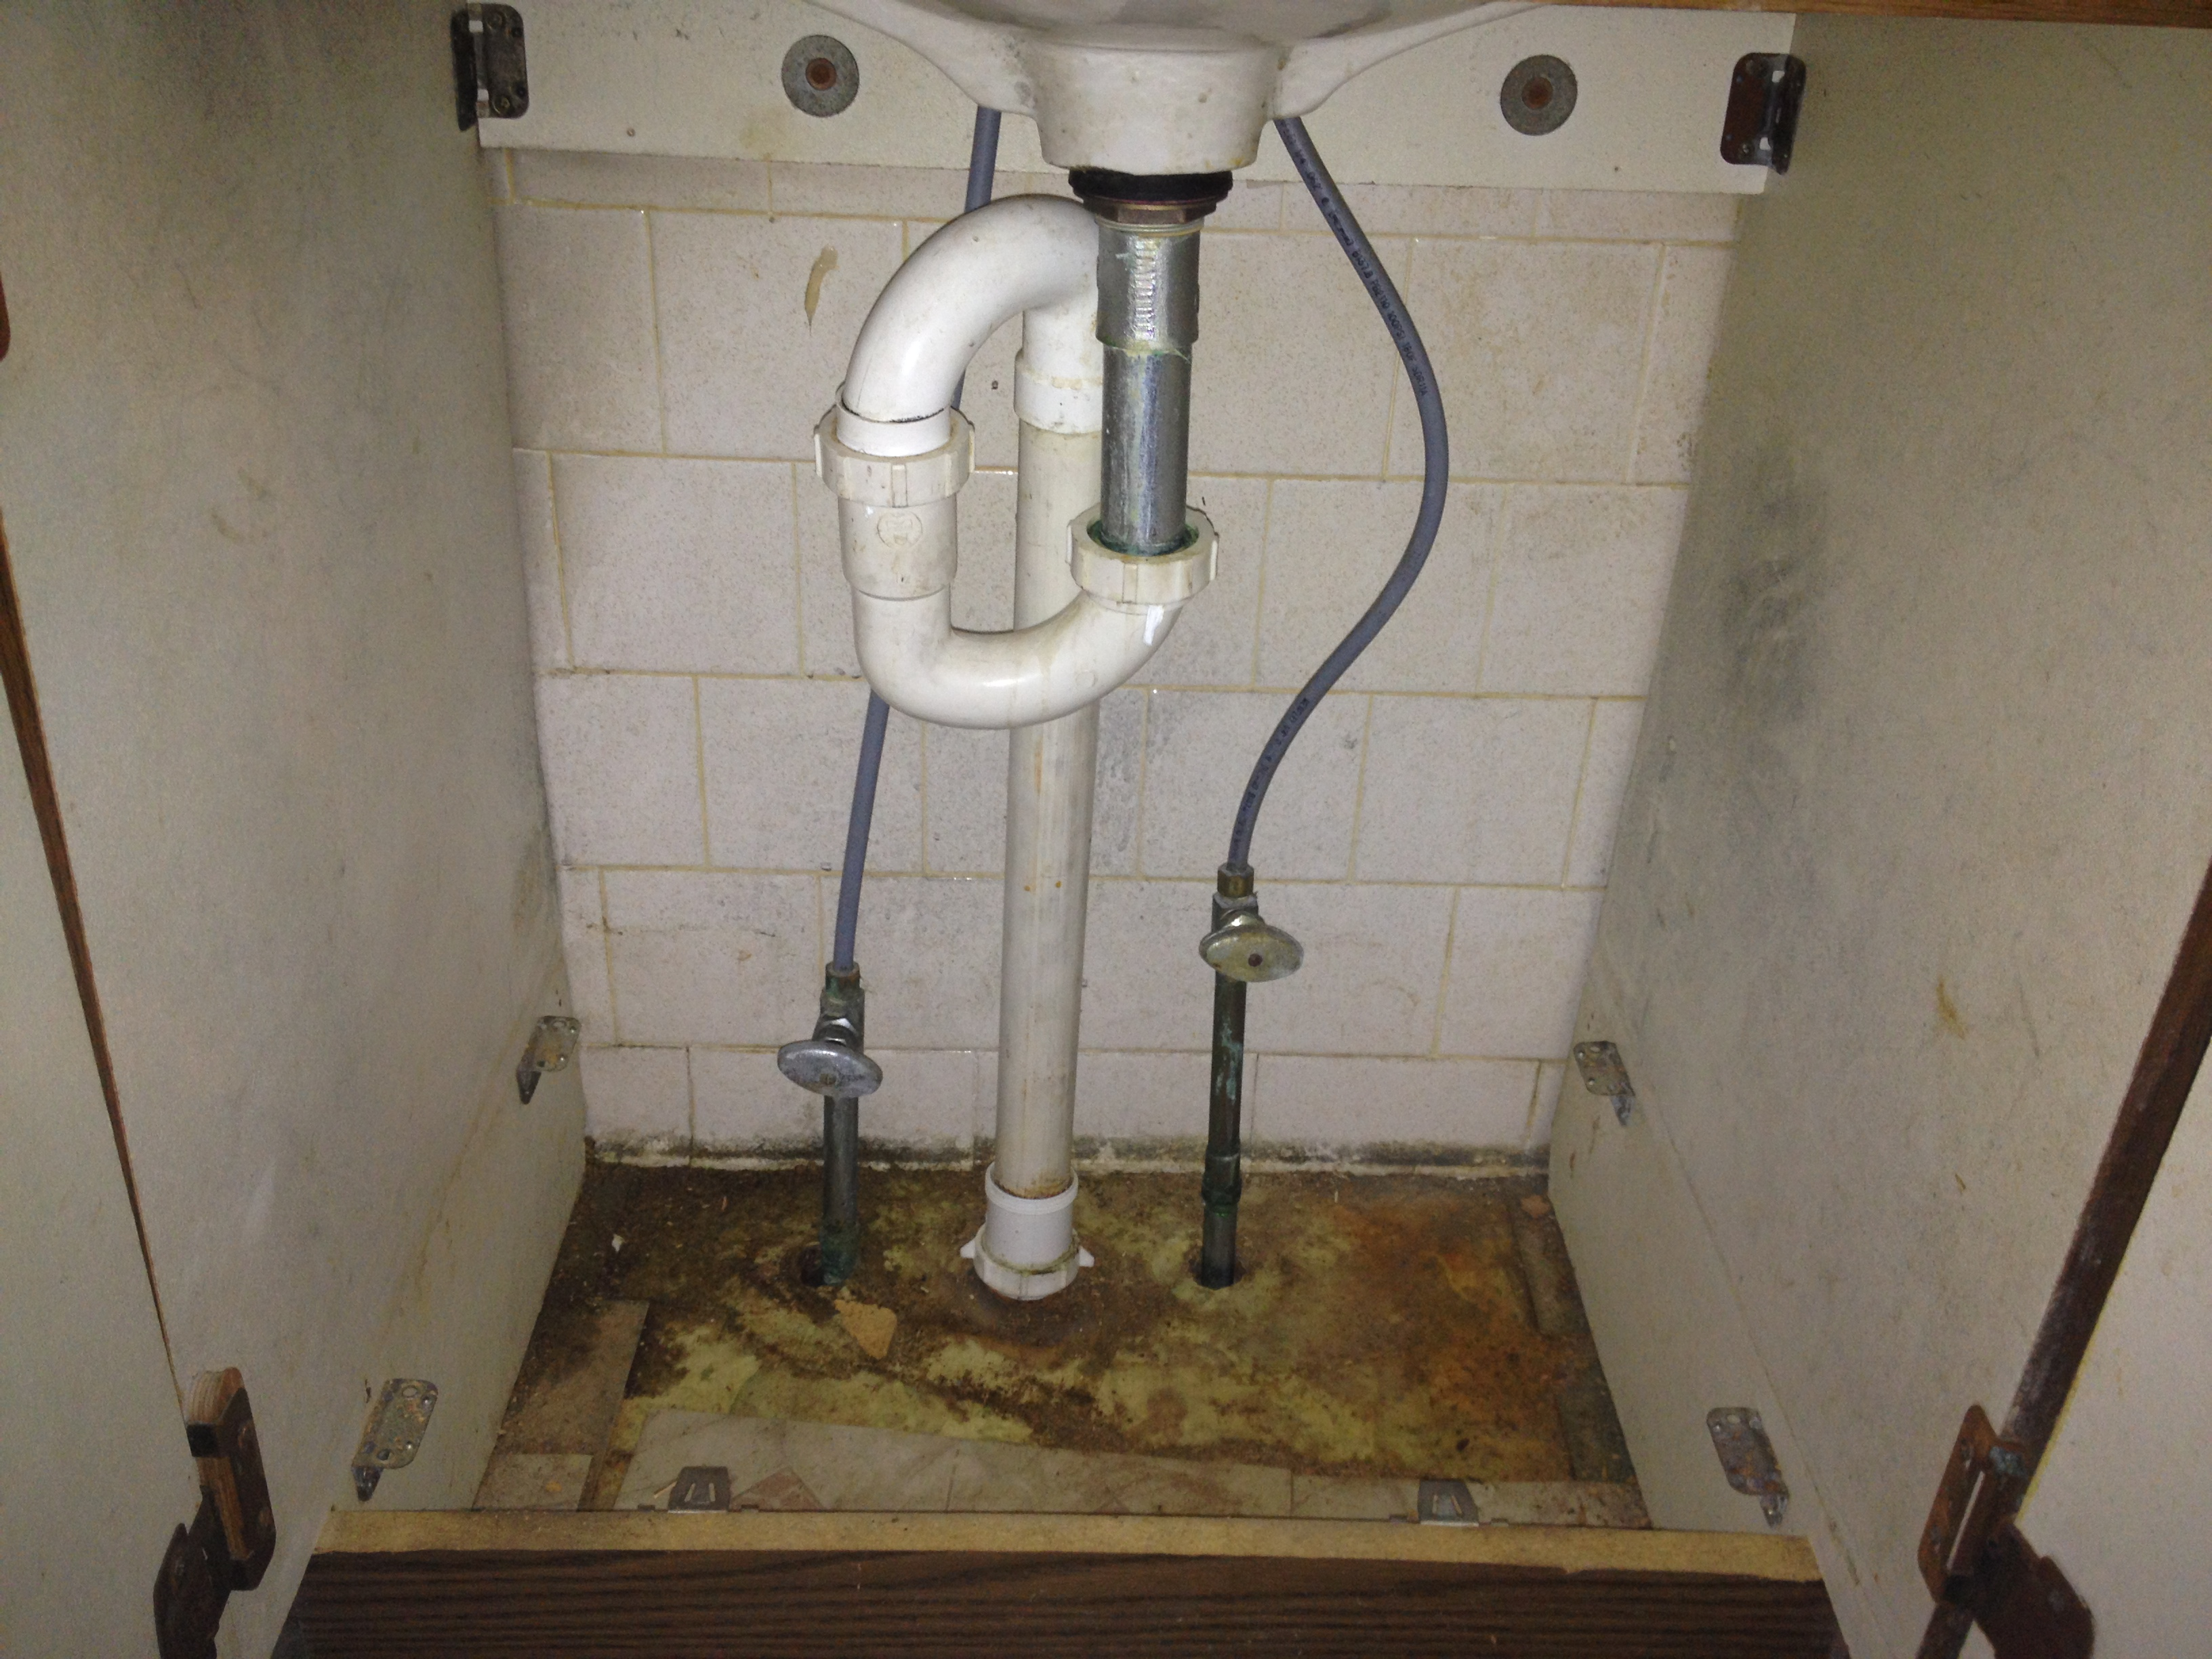 Replacing The Bathroom Sink